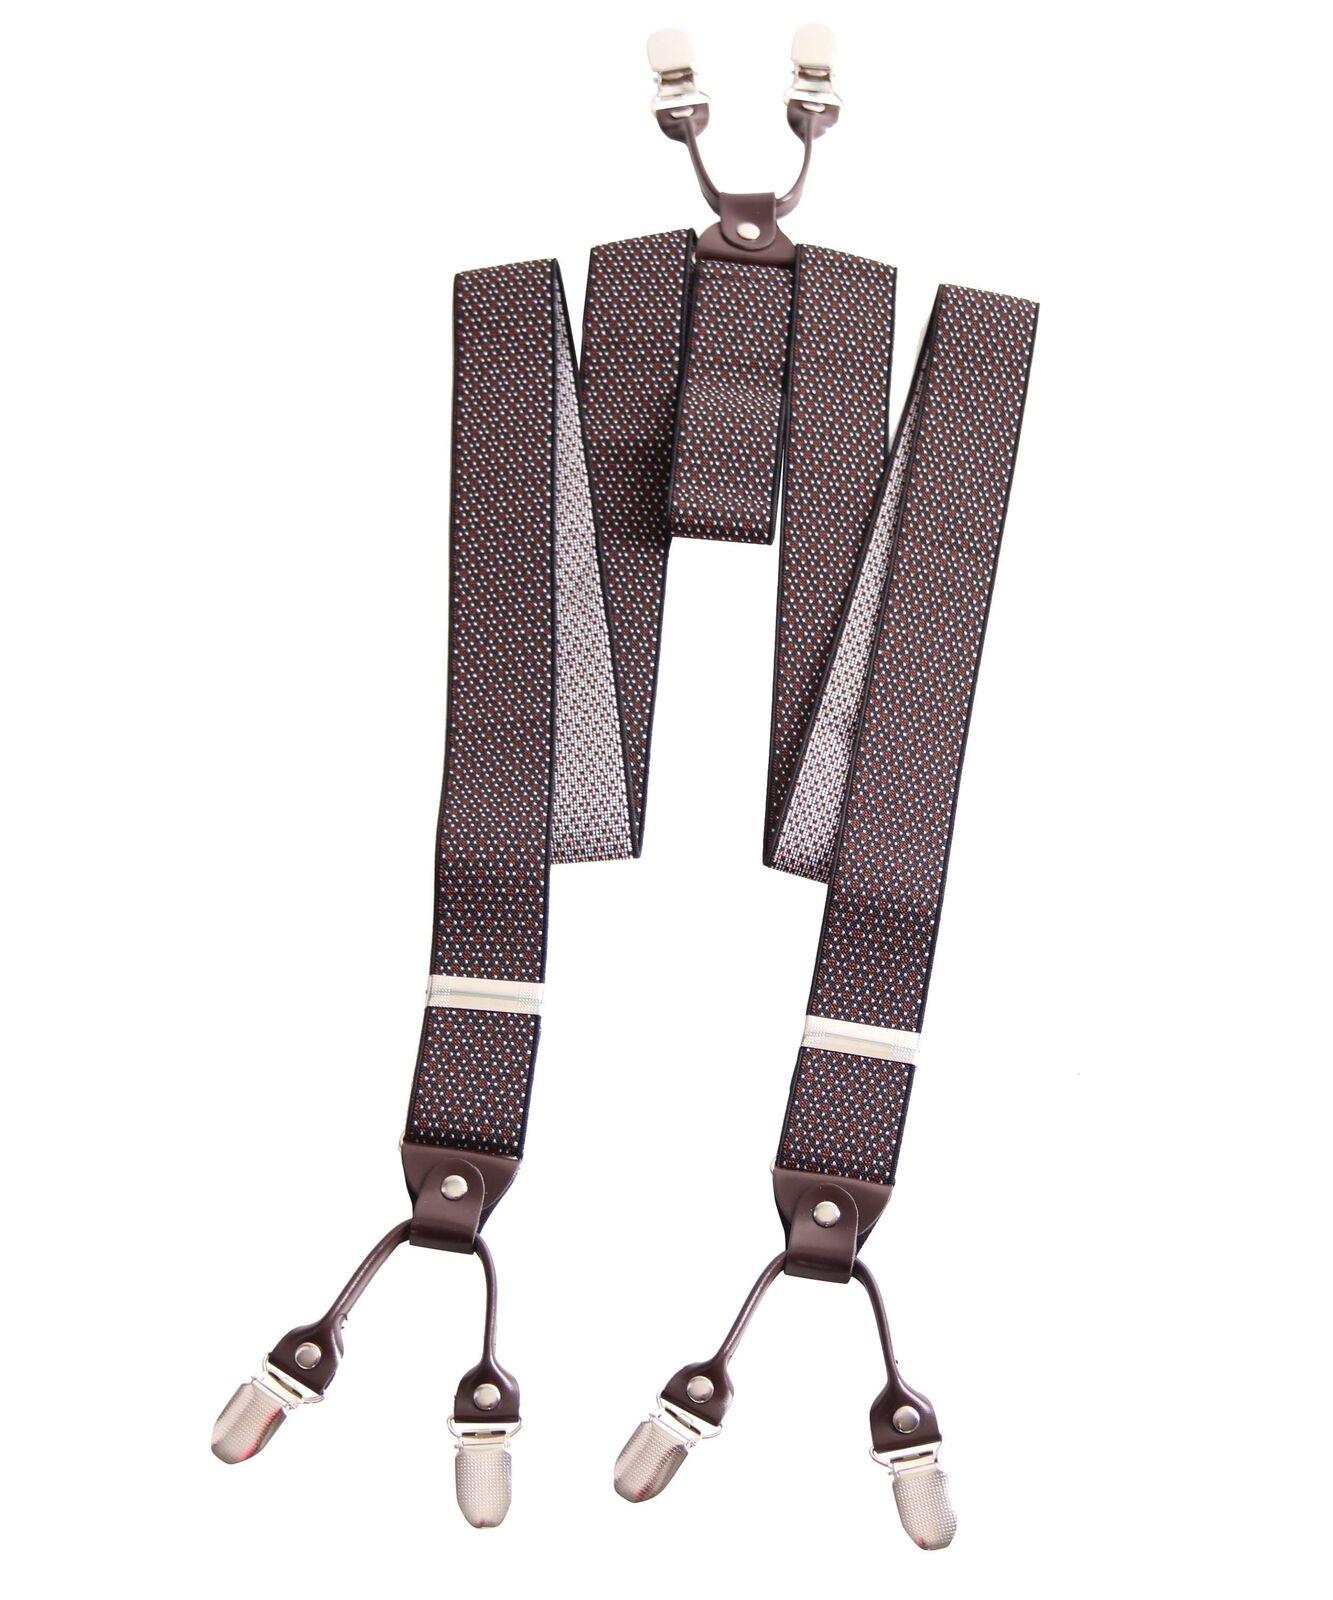 UNISEX retro Rockabilly vintage Style Suspenders Hosenträger gemustert breit m.